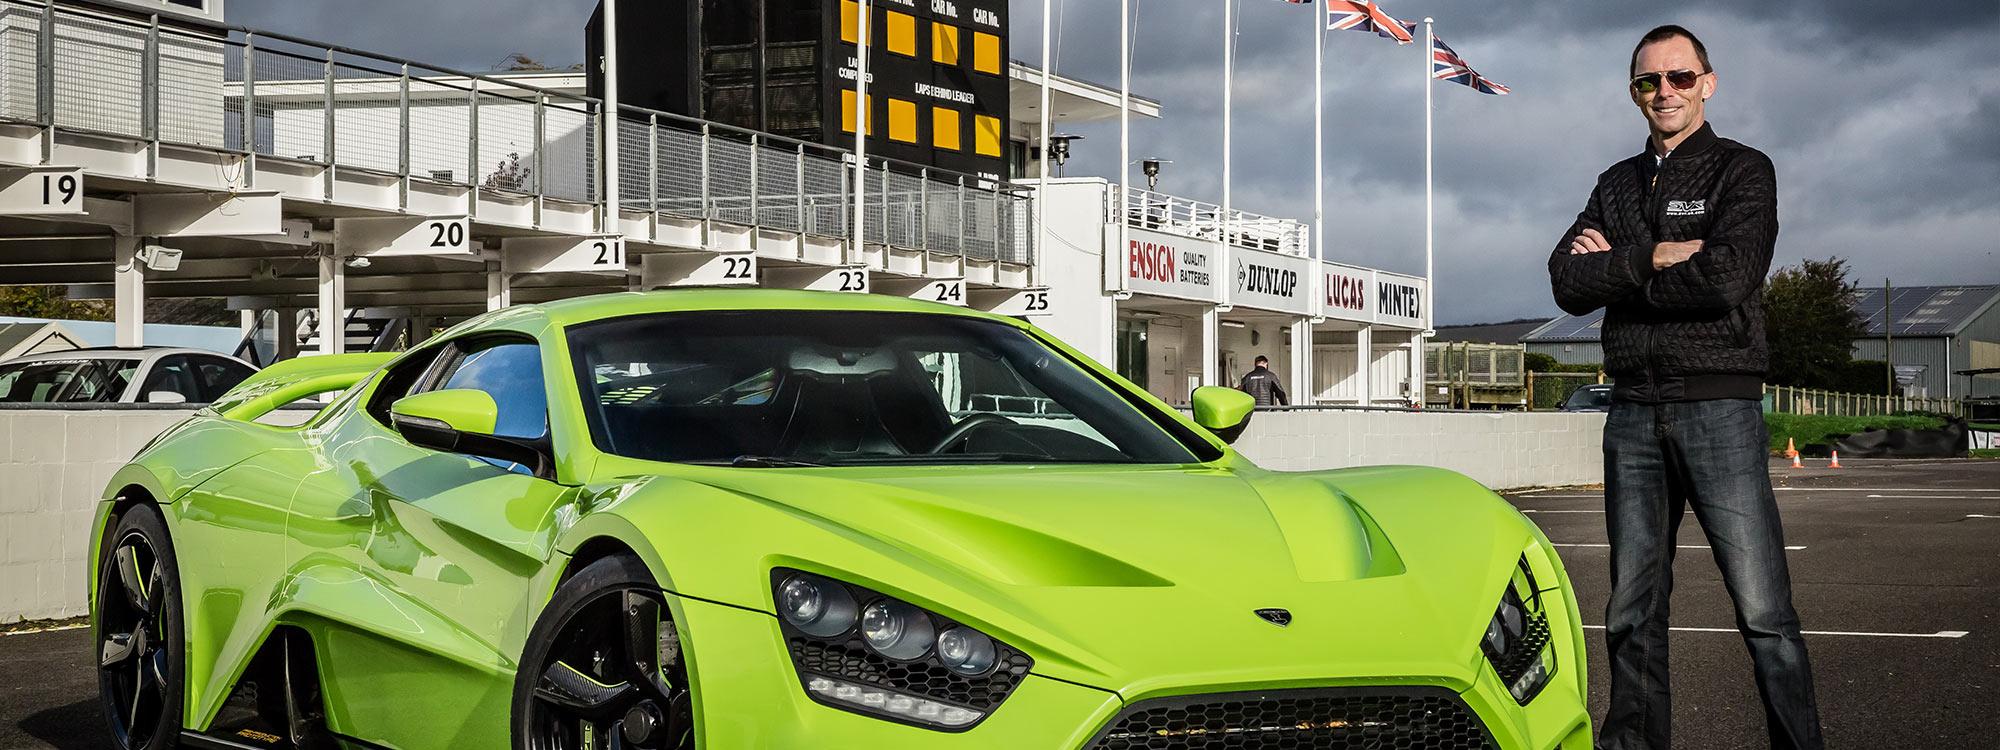 Lee Cunningham - Automotive Events